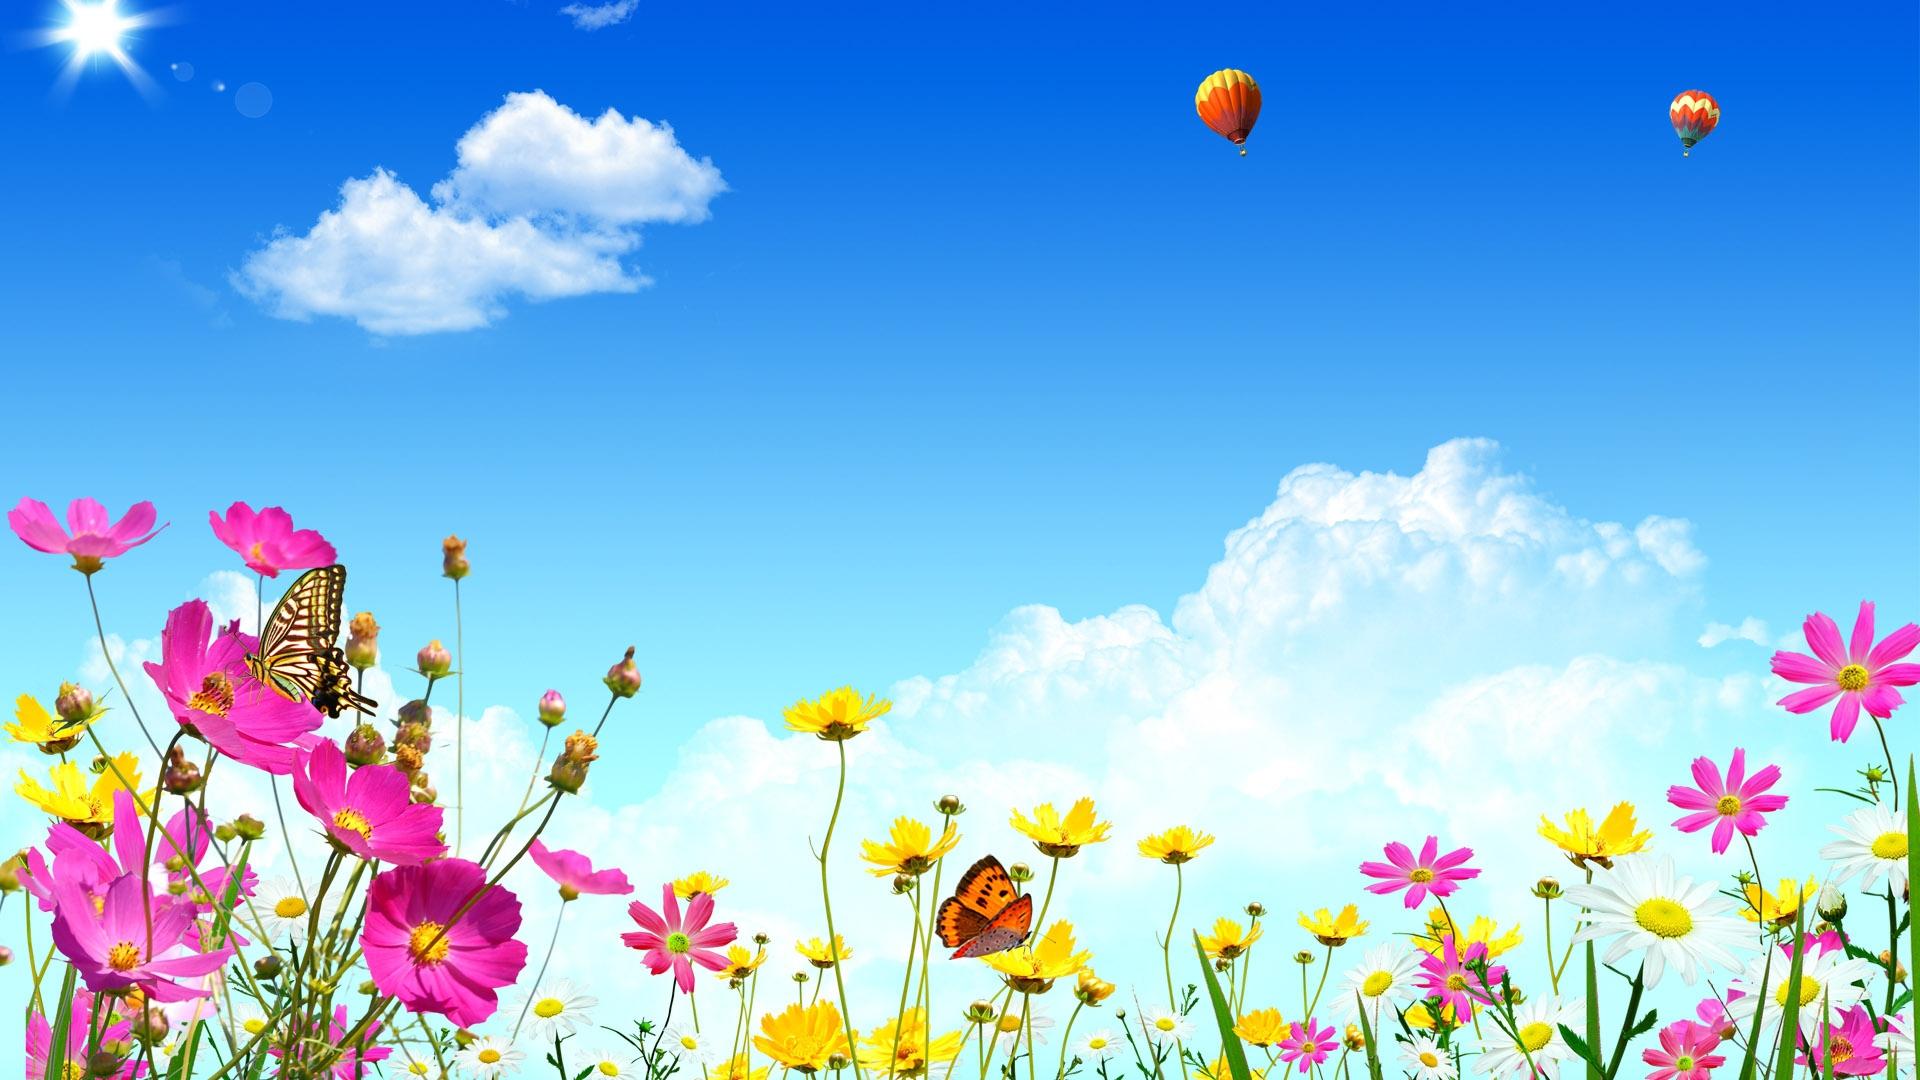 download wallpaper 1920x1080 tulips flowers butterflies nature